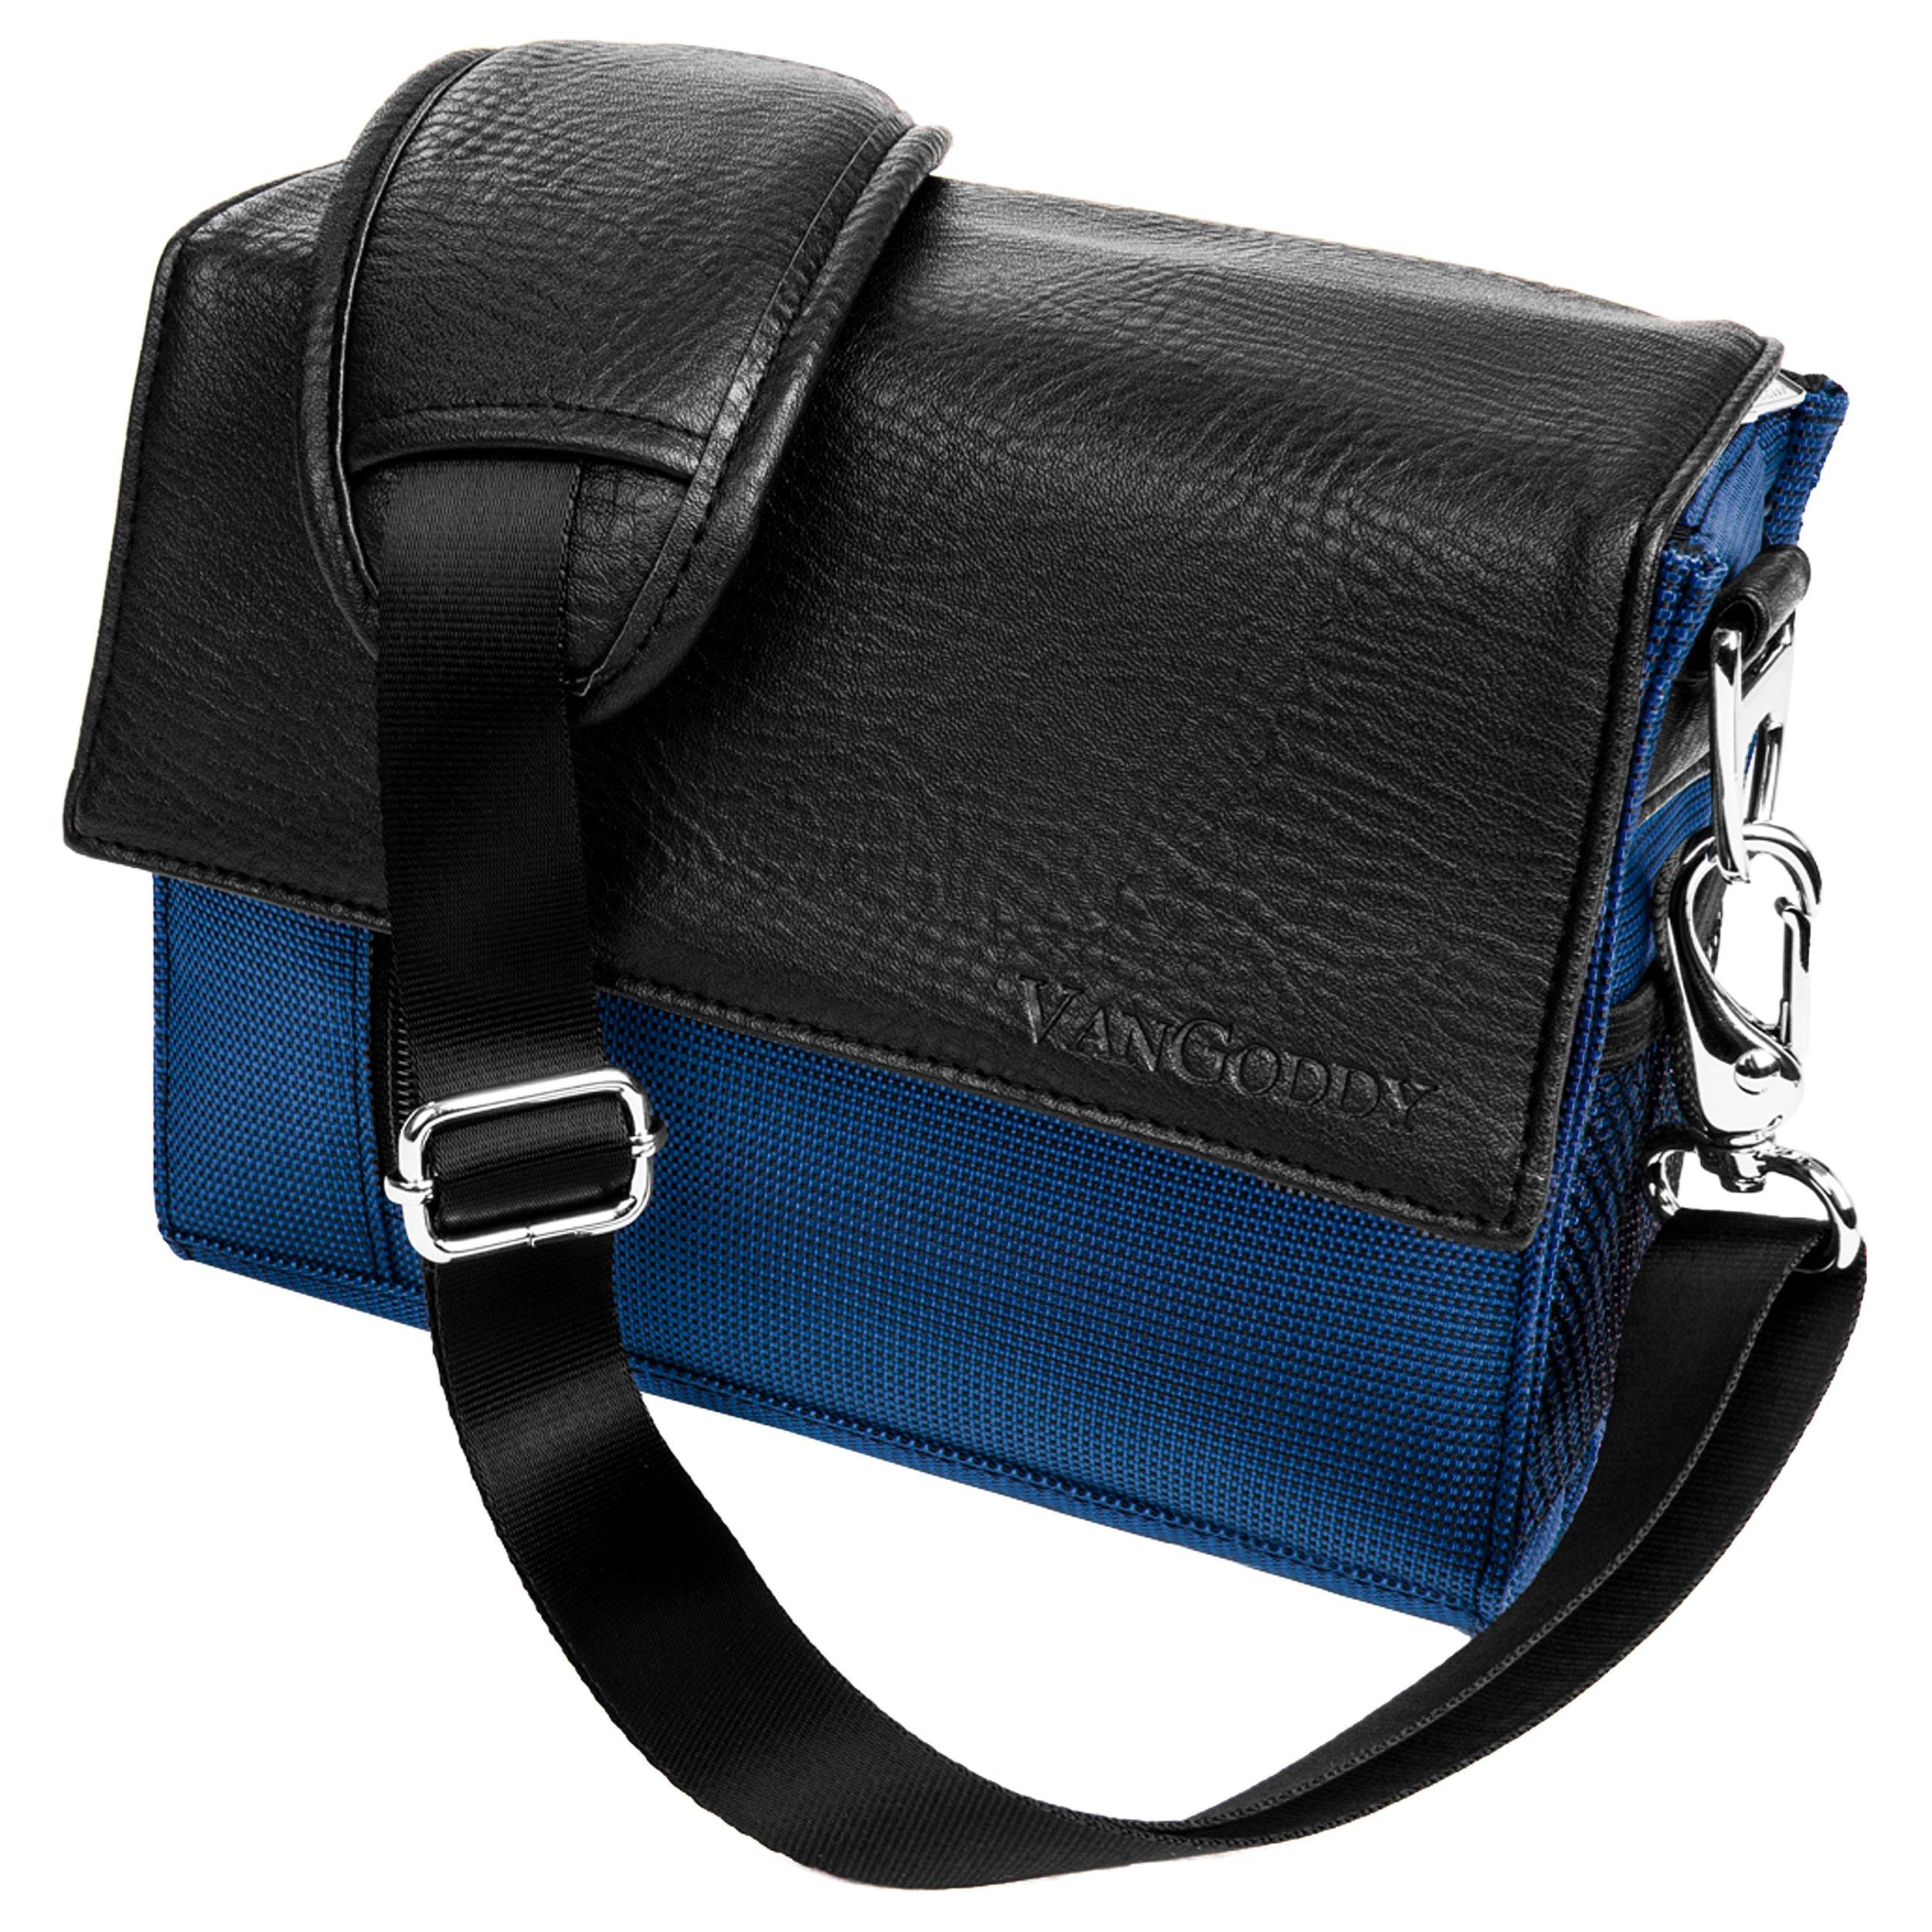 VanGoddy Metric Blue Cross Body Shoulder Camera Bag for Panasonic LUMIX Series Compact to Advanced System Camera'ss